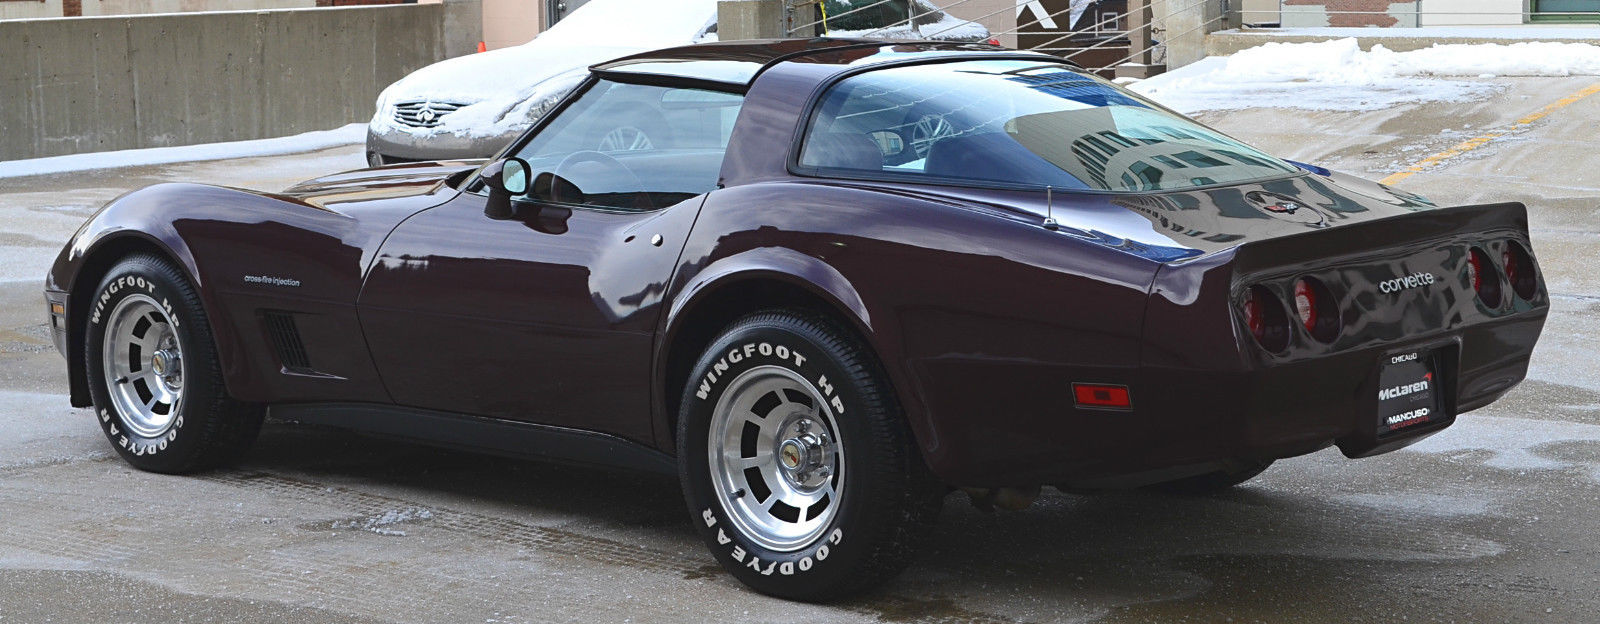 1982 Chevrolet Corvette Stingray Dark Claret Metallic